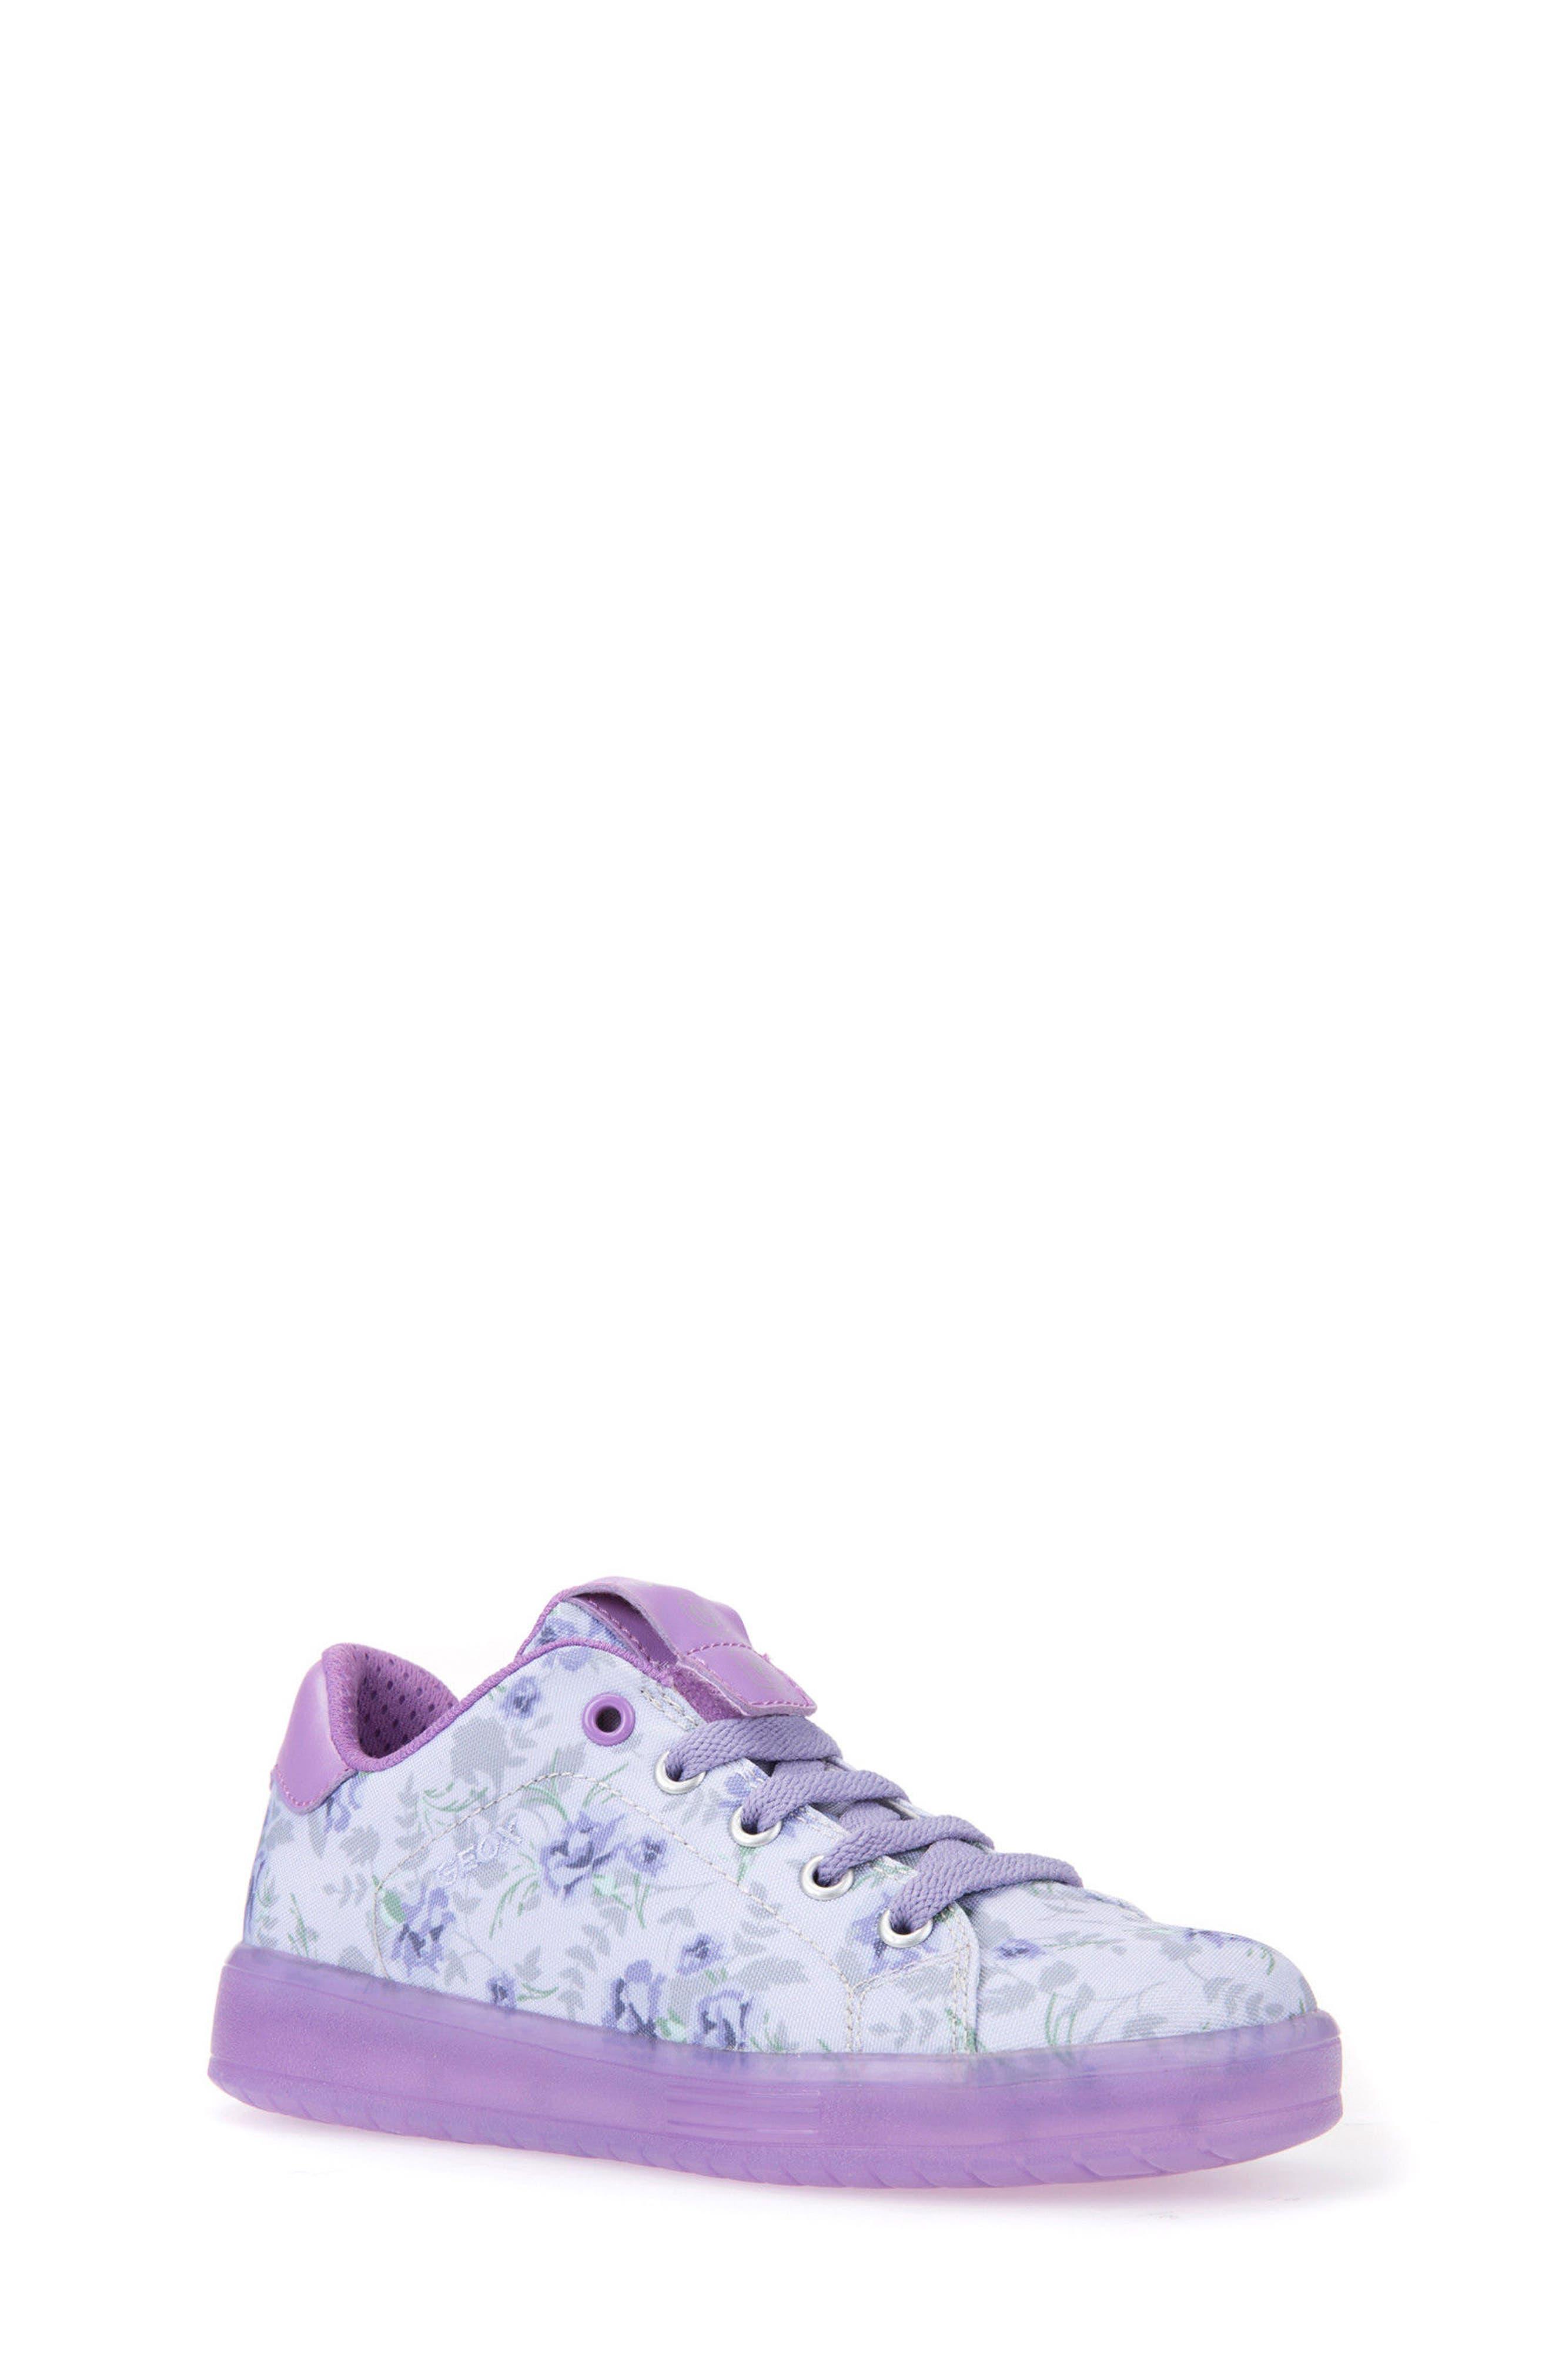 Alternate Image 1 Selected - Geox Kommodor Light-Up Sneaker (Toddler, Little Kid & Big Kid)